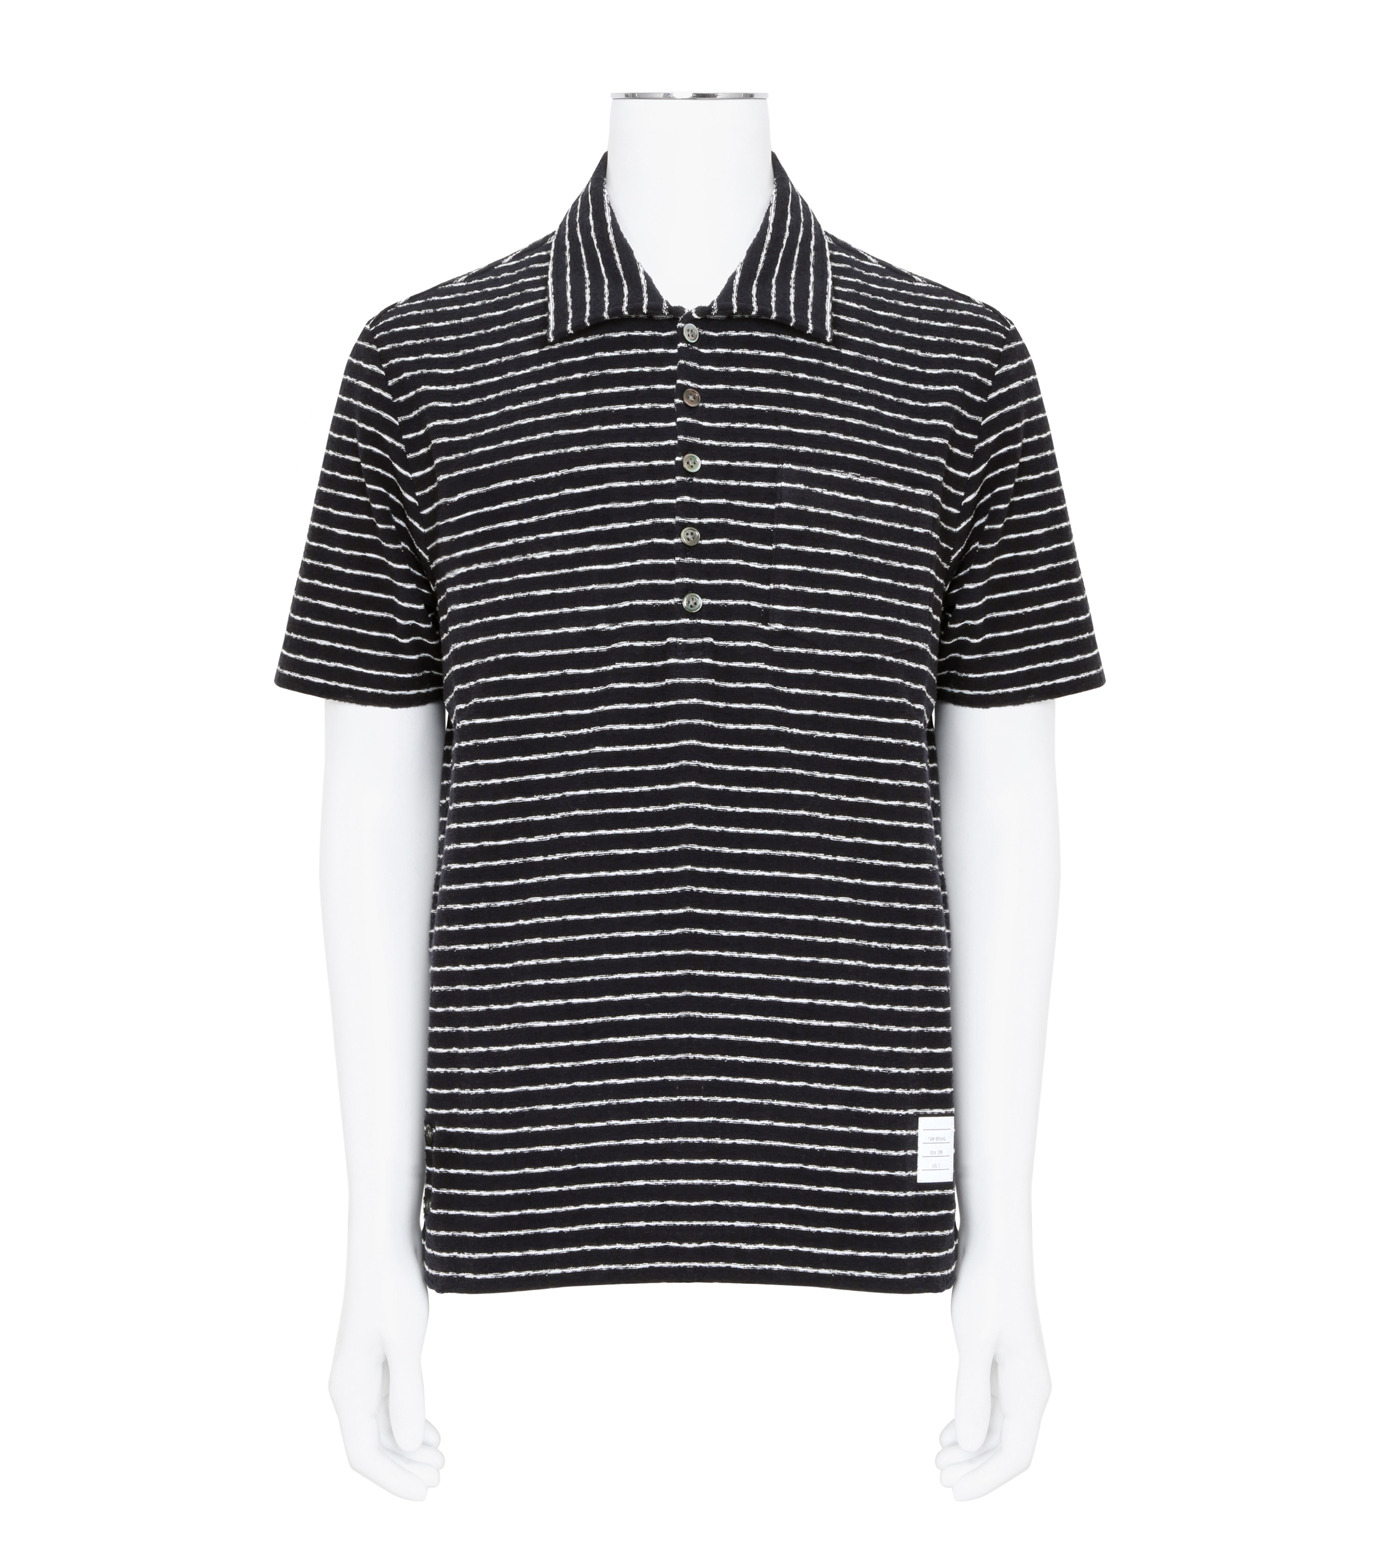 Thom Browne(トムブラウン)のChalk Stripe Polo-NAVY(カットソー/cut and sewn)-MJP032A01429-93 拡大詳細画像1